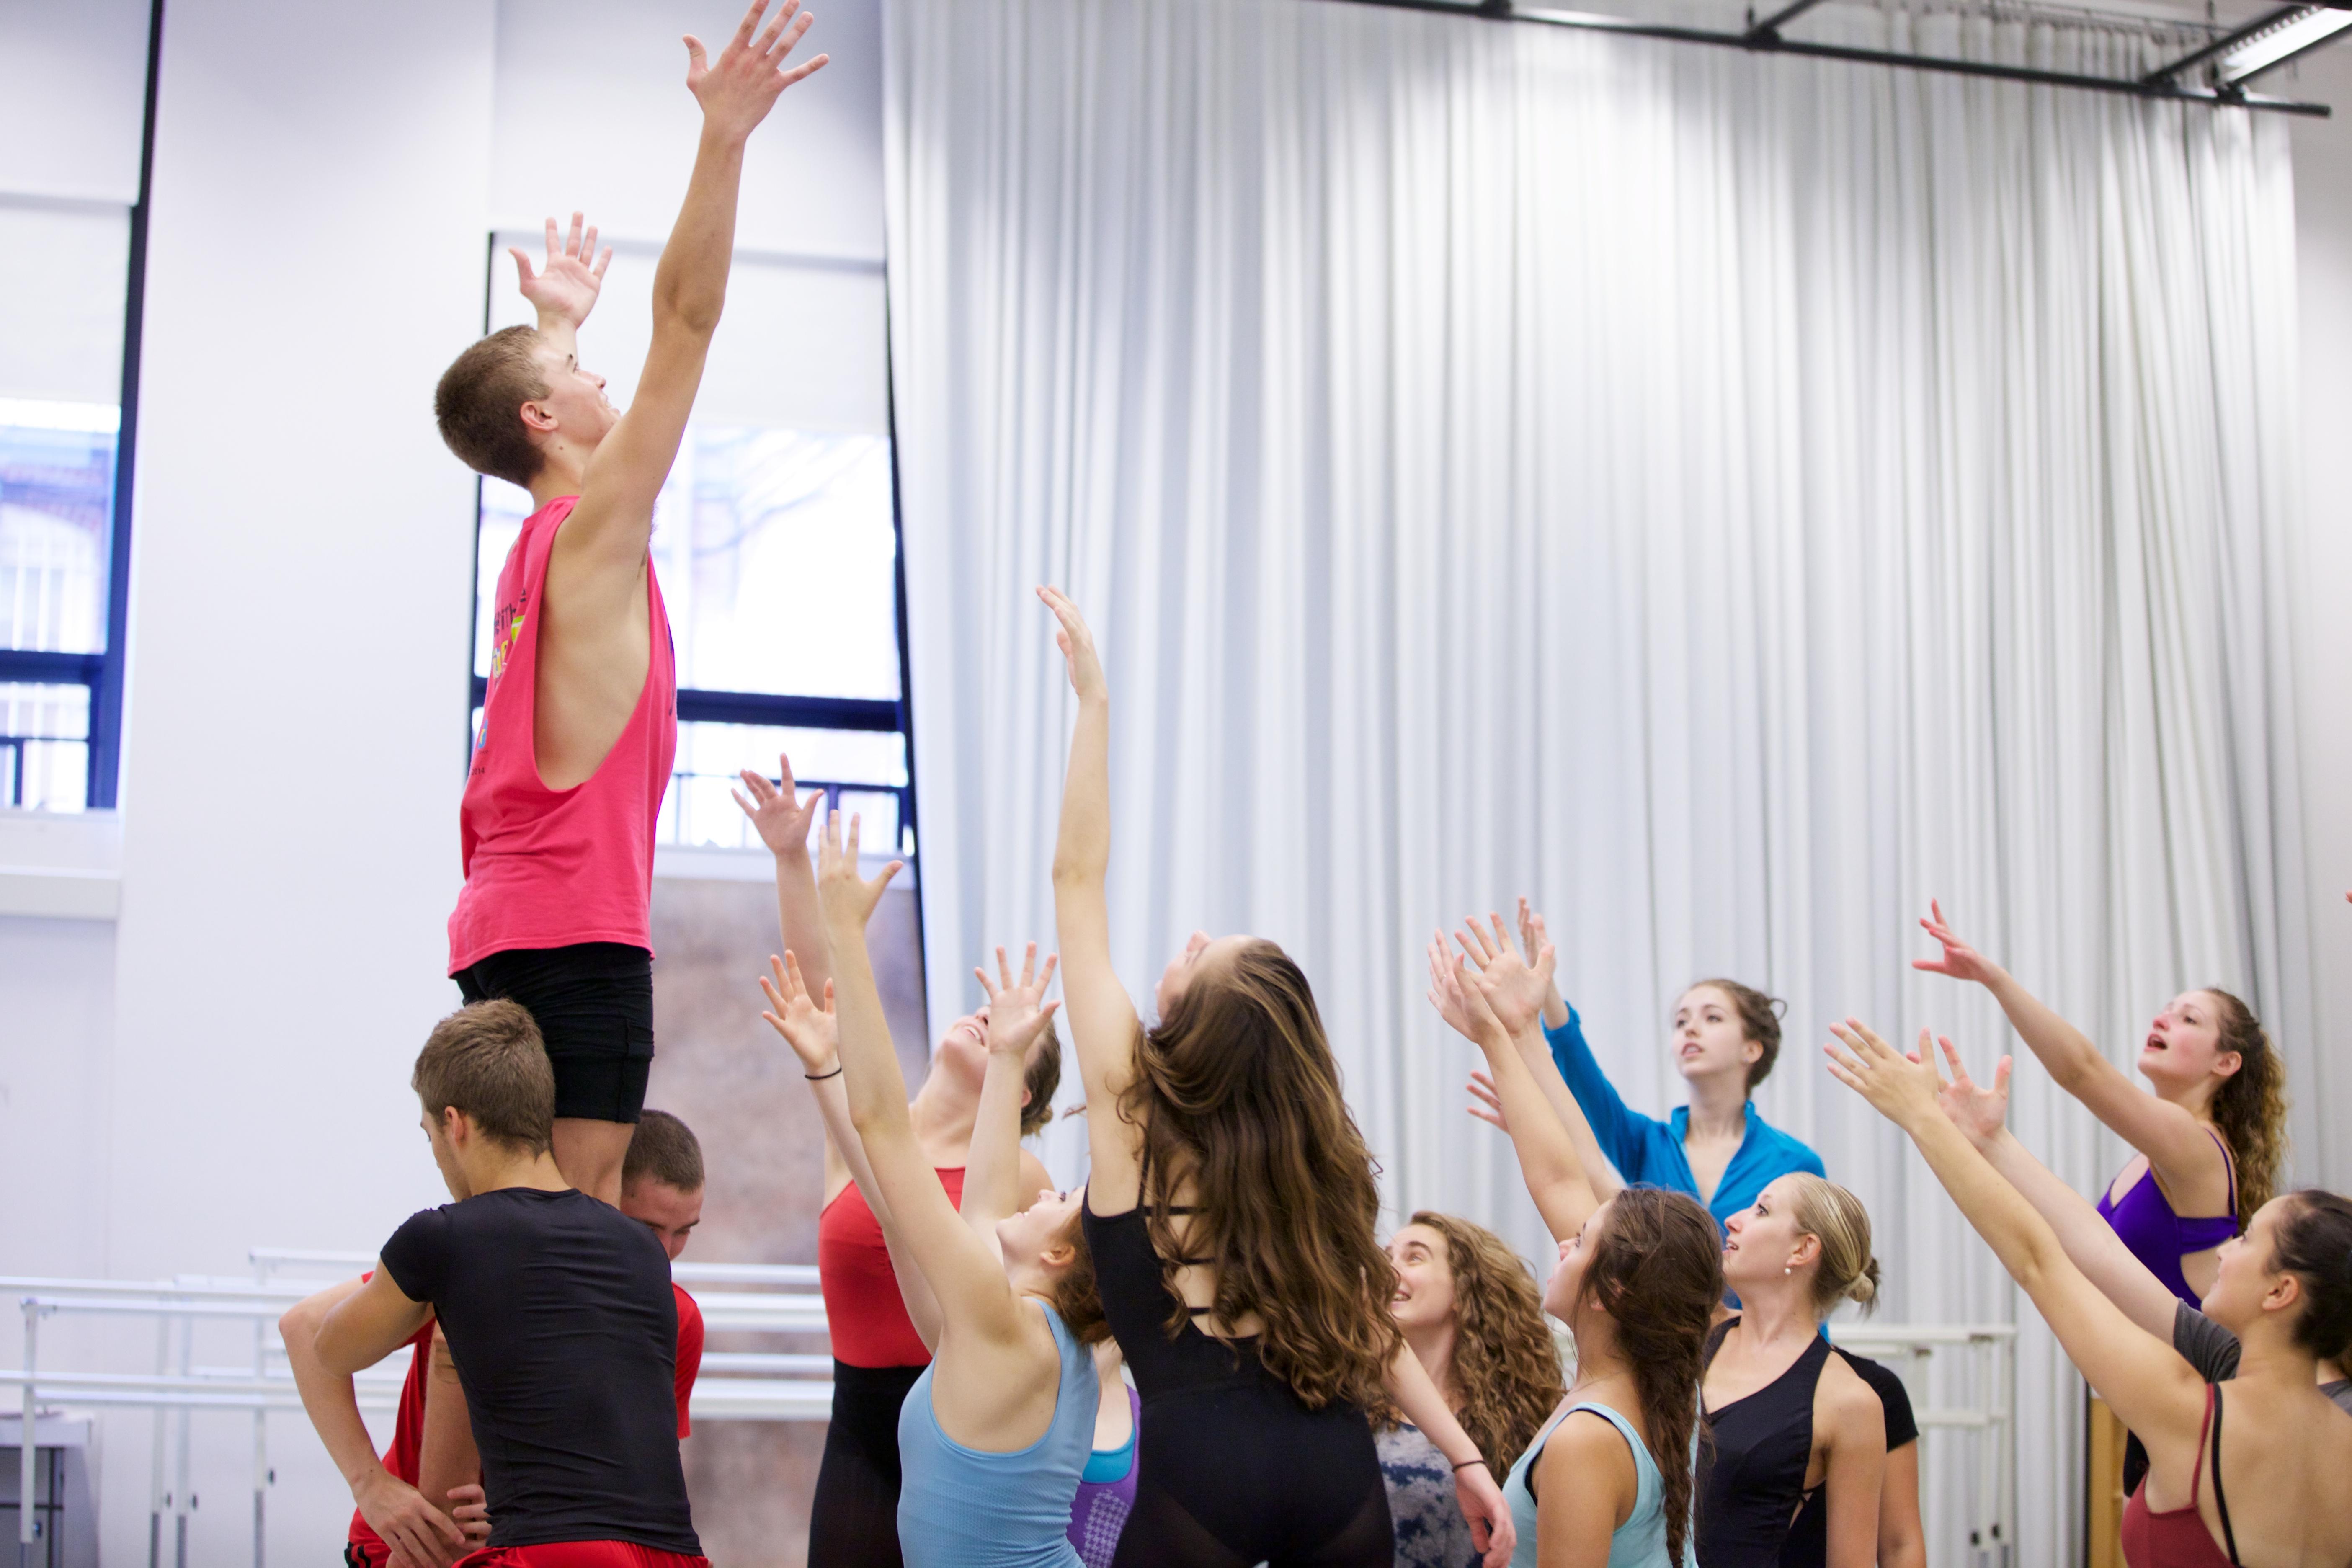 Summer Program - Dance | The Boston Conservatory Summer Intensives